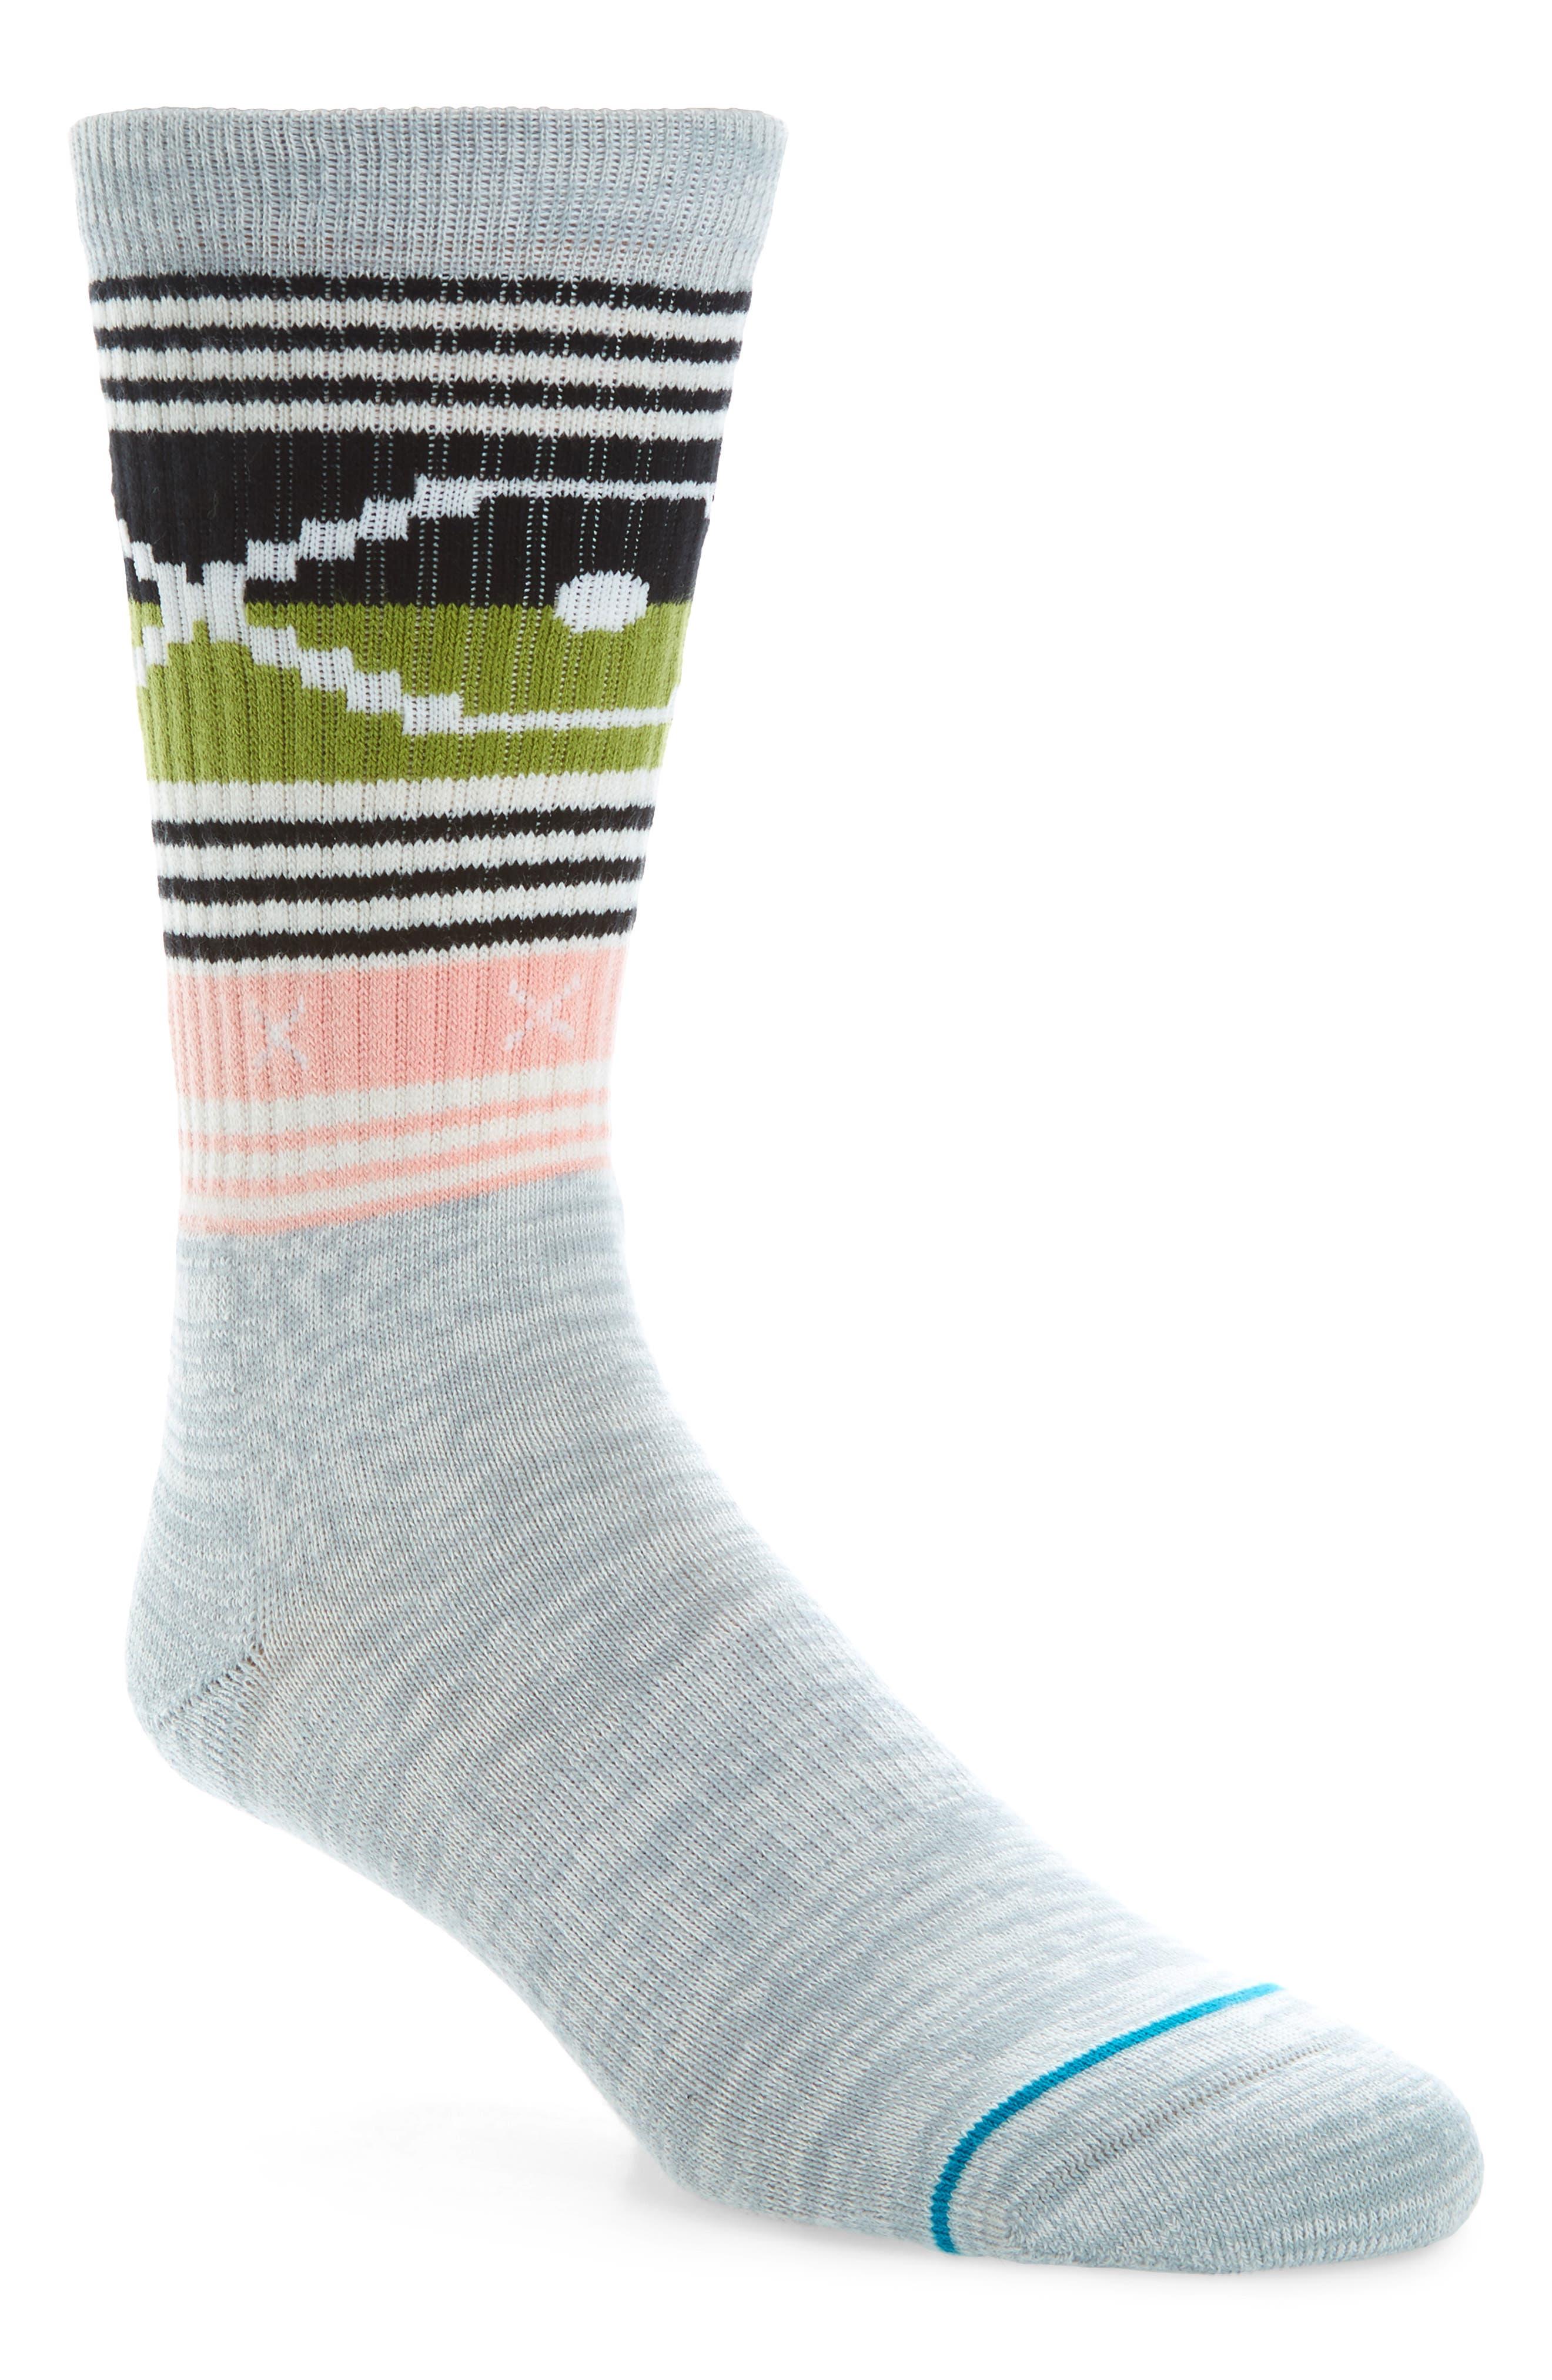 Harries Crew Socks,                         Main,                         color, 020